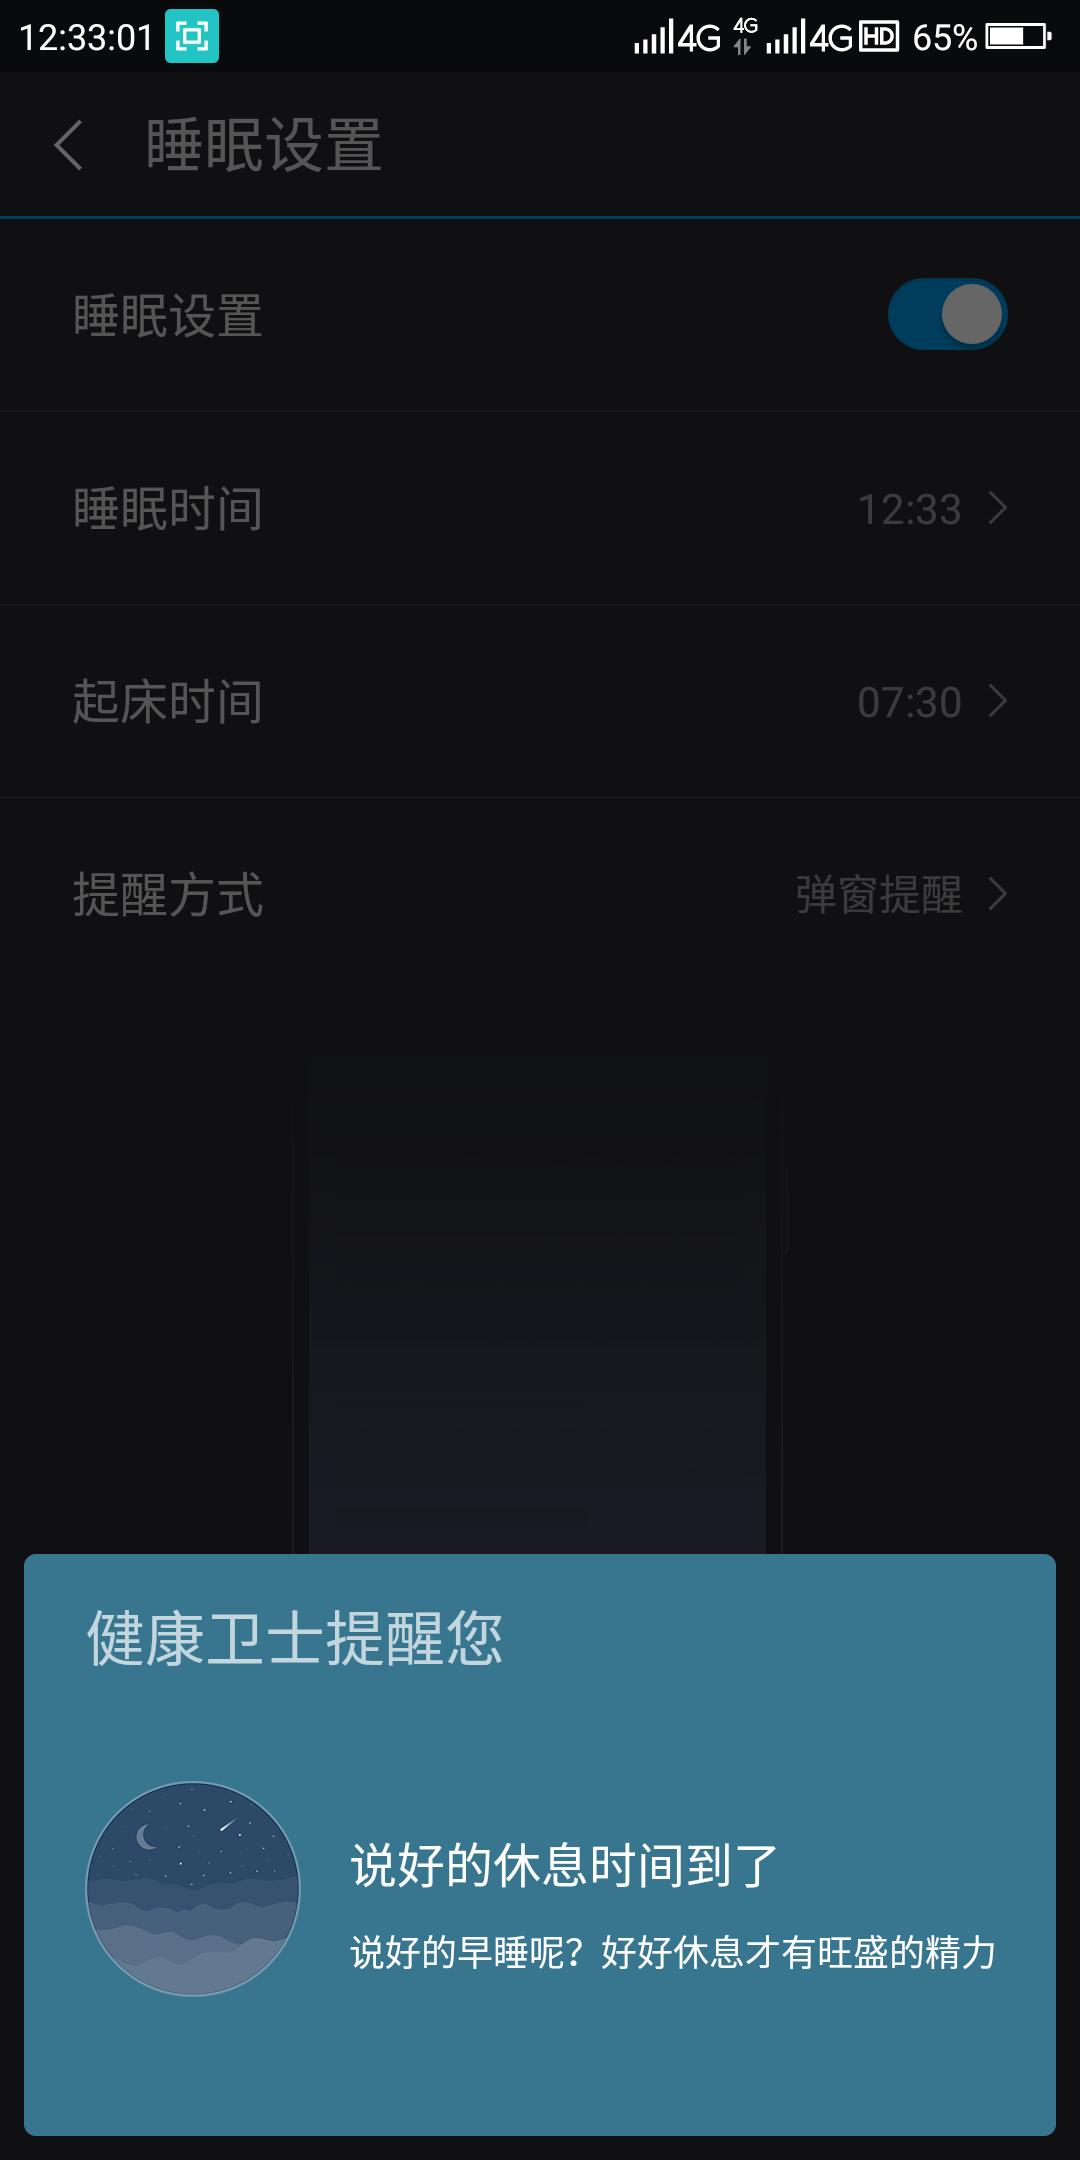 Screenshot_2019-04-08-12-33-05.png